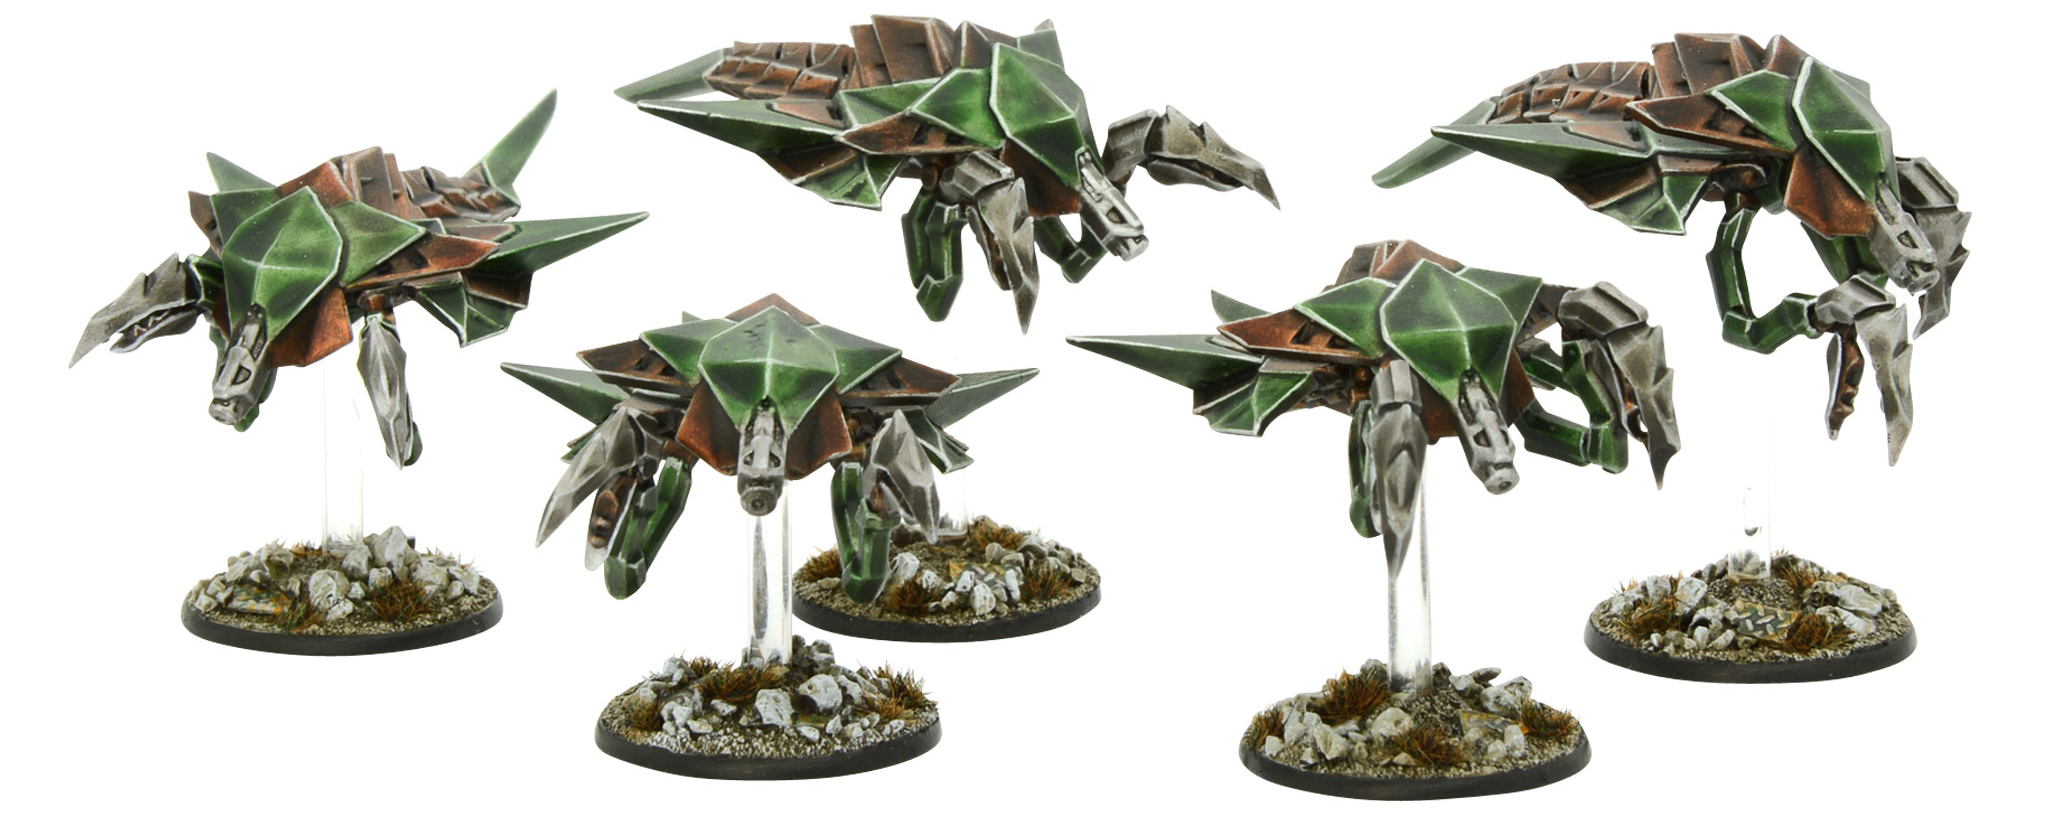 New Beyond the Gates of Antares Virai Defender Squad